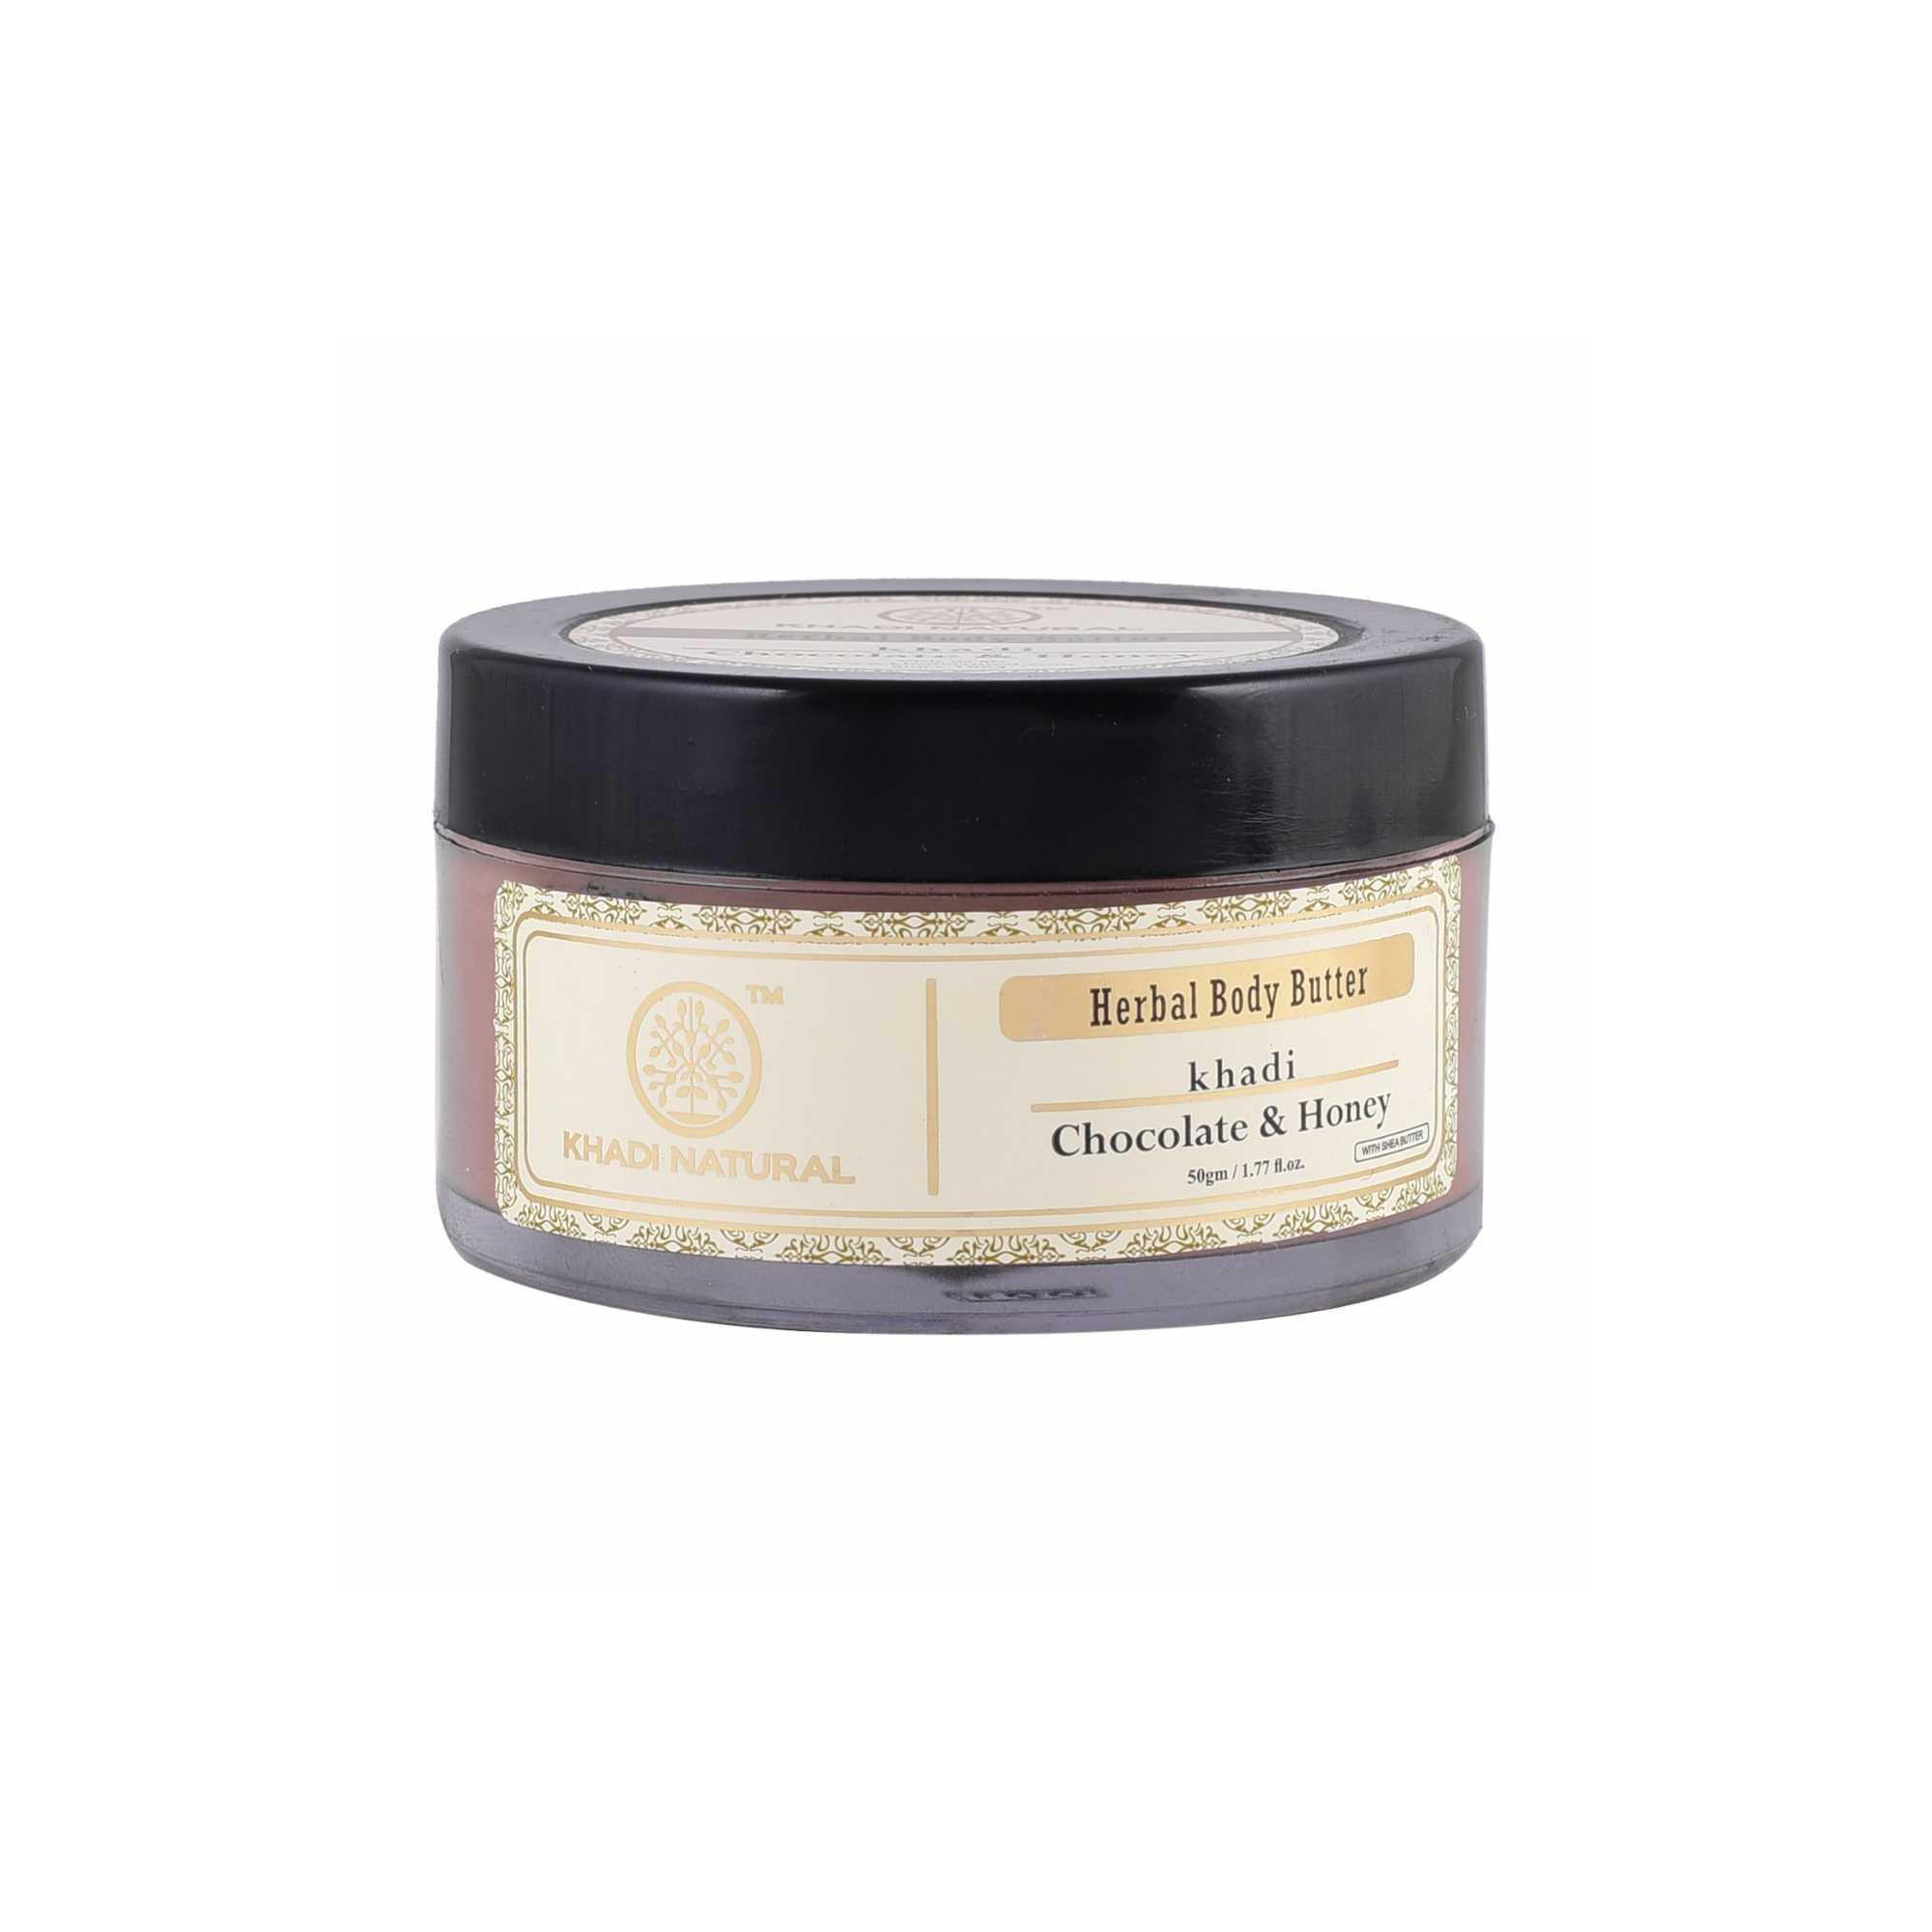 Khadi Natural Ayurvedic Chocolate Honey Body Butter - body butter under 200